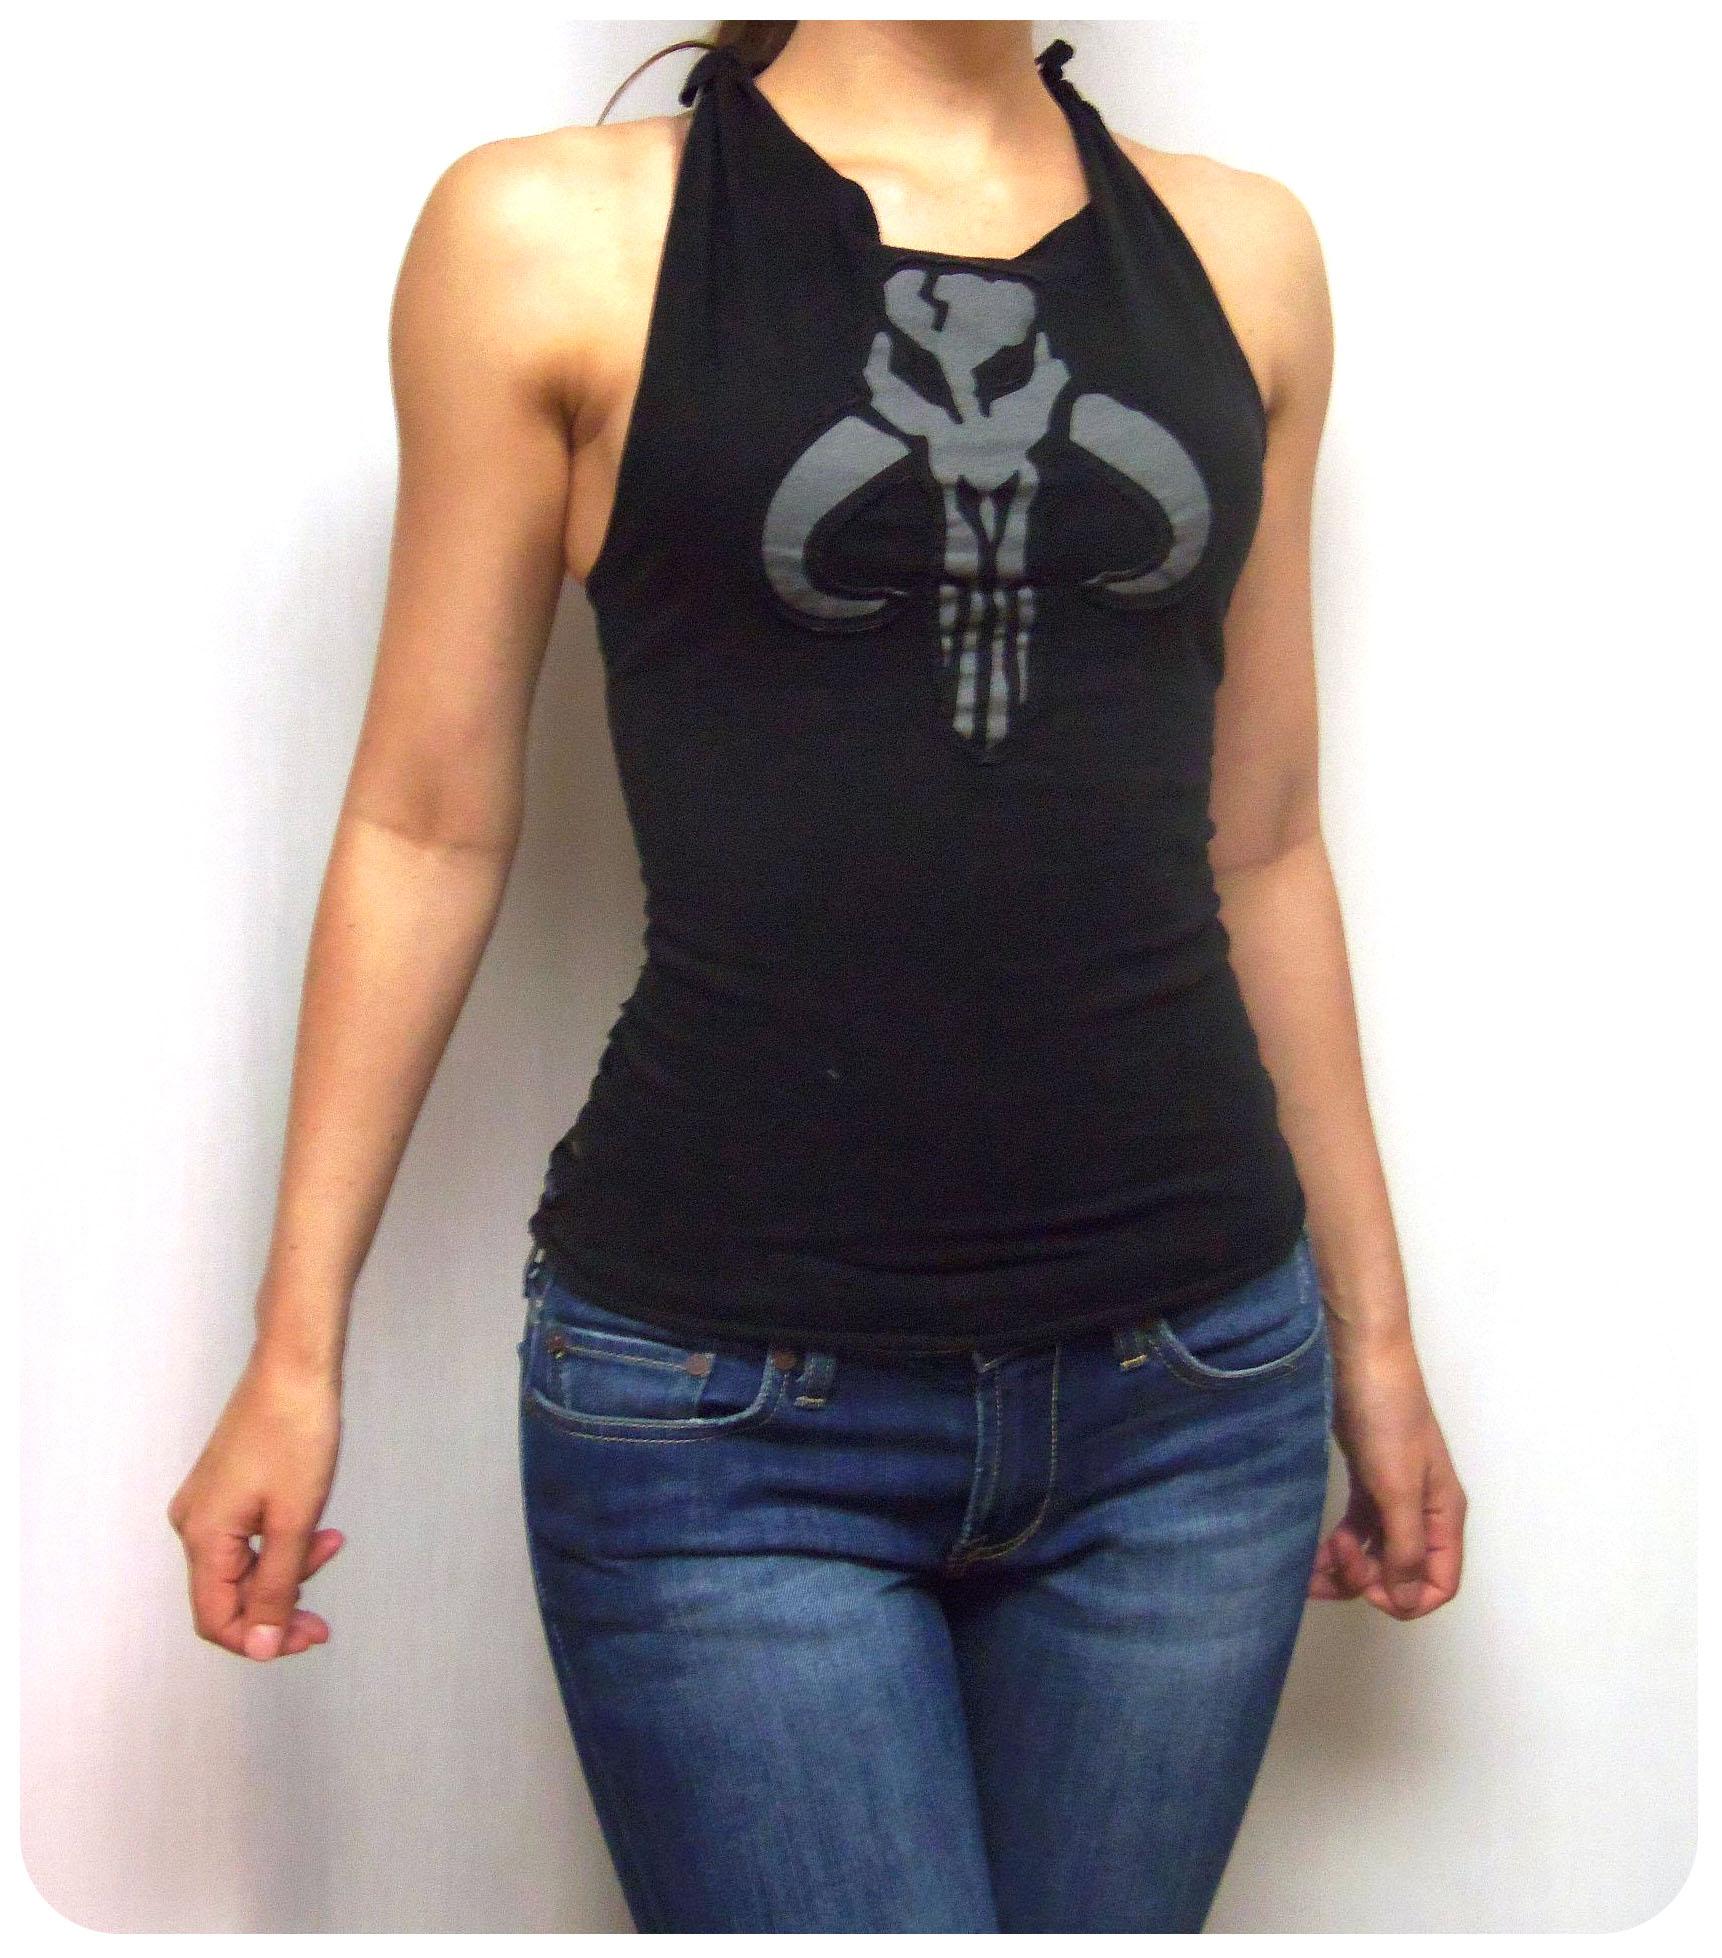 Ripped T Shirt Designs